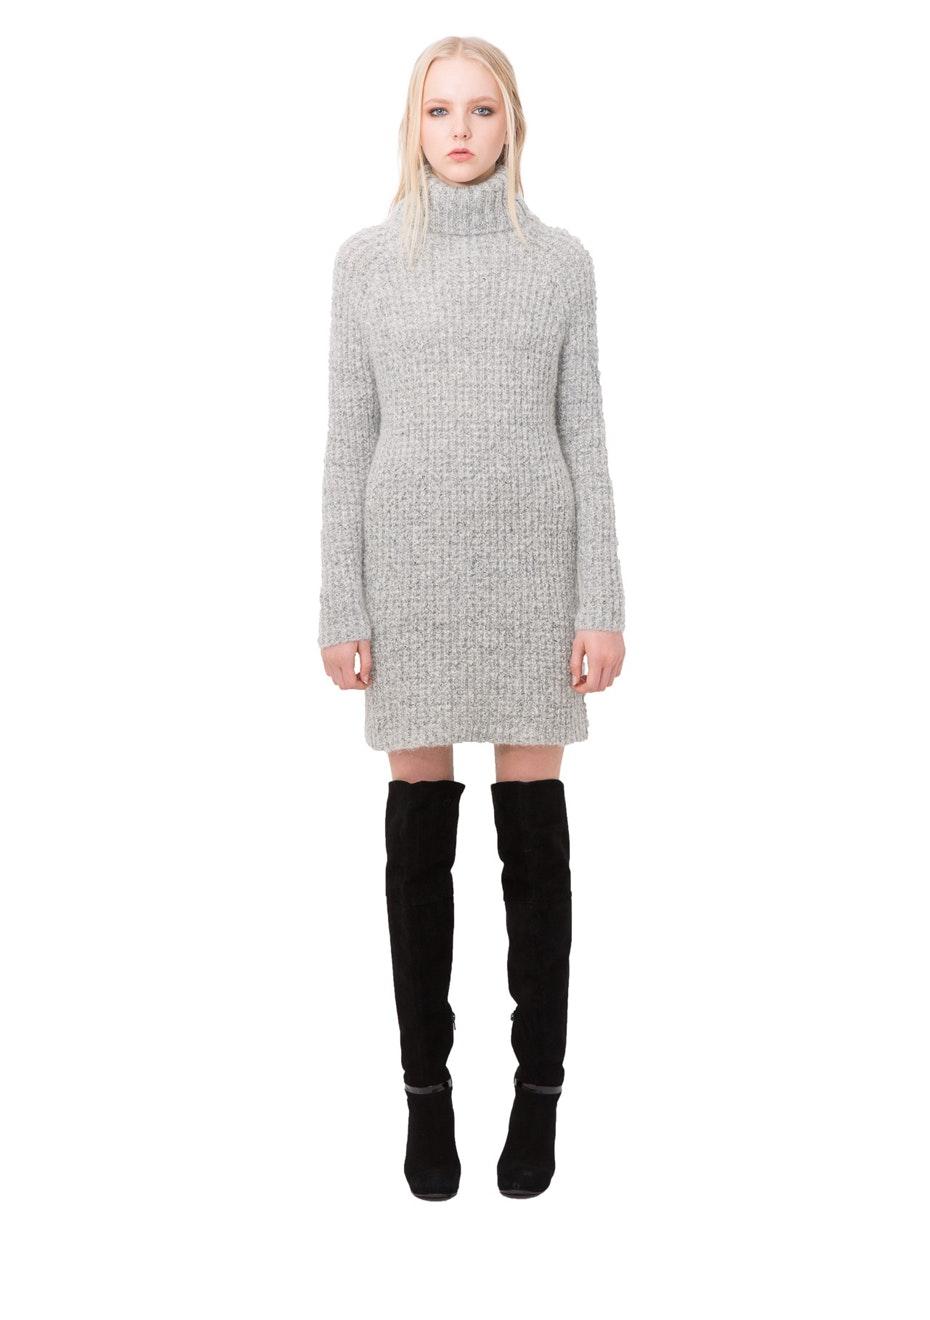 Stolen Girlfriends Club - Swamp Life Sweater Dress - Ivory